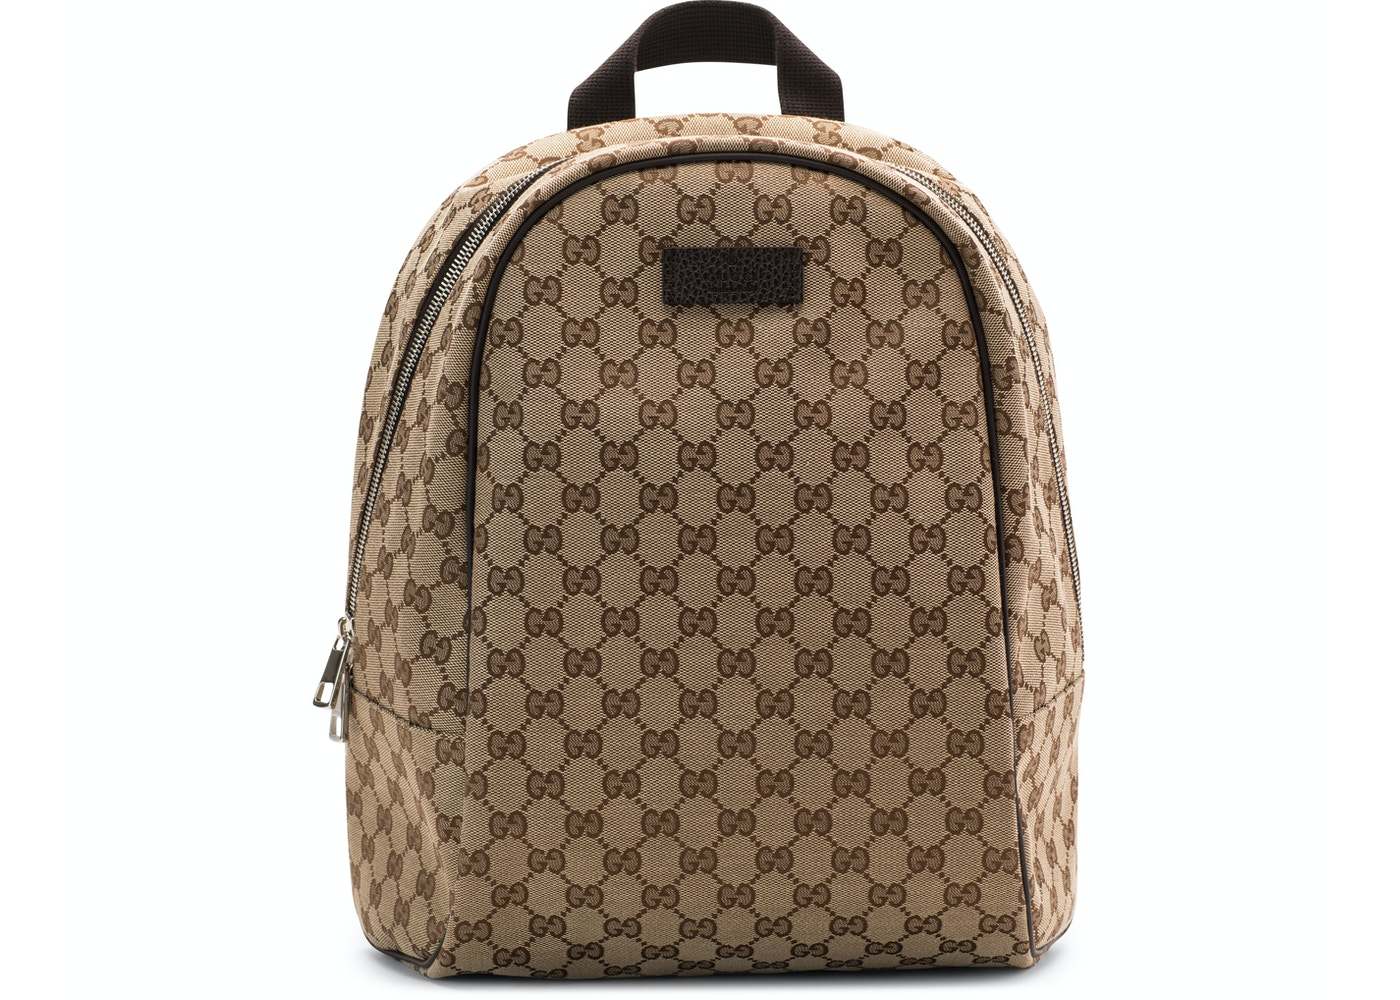 809fcd23a463 Gucci Top Zip Backpack Monogram GG Beige Brown. Monogram GG Beige Brown